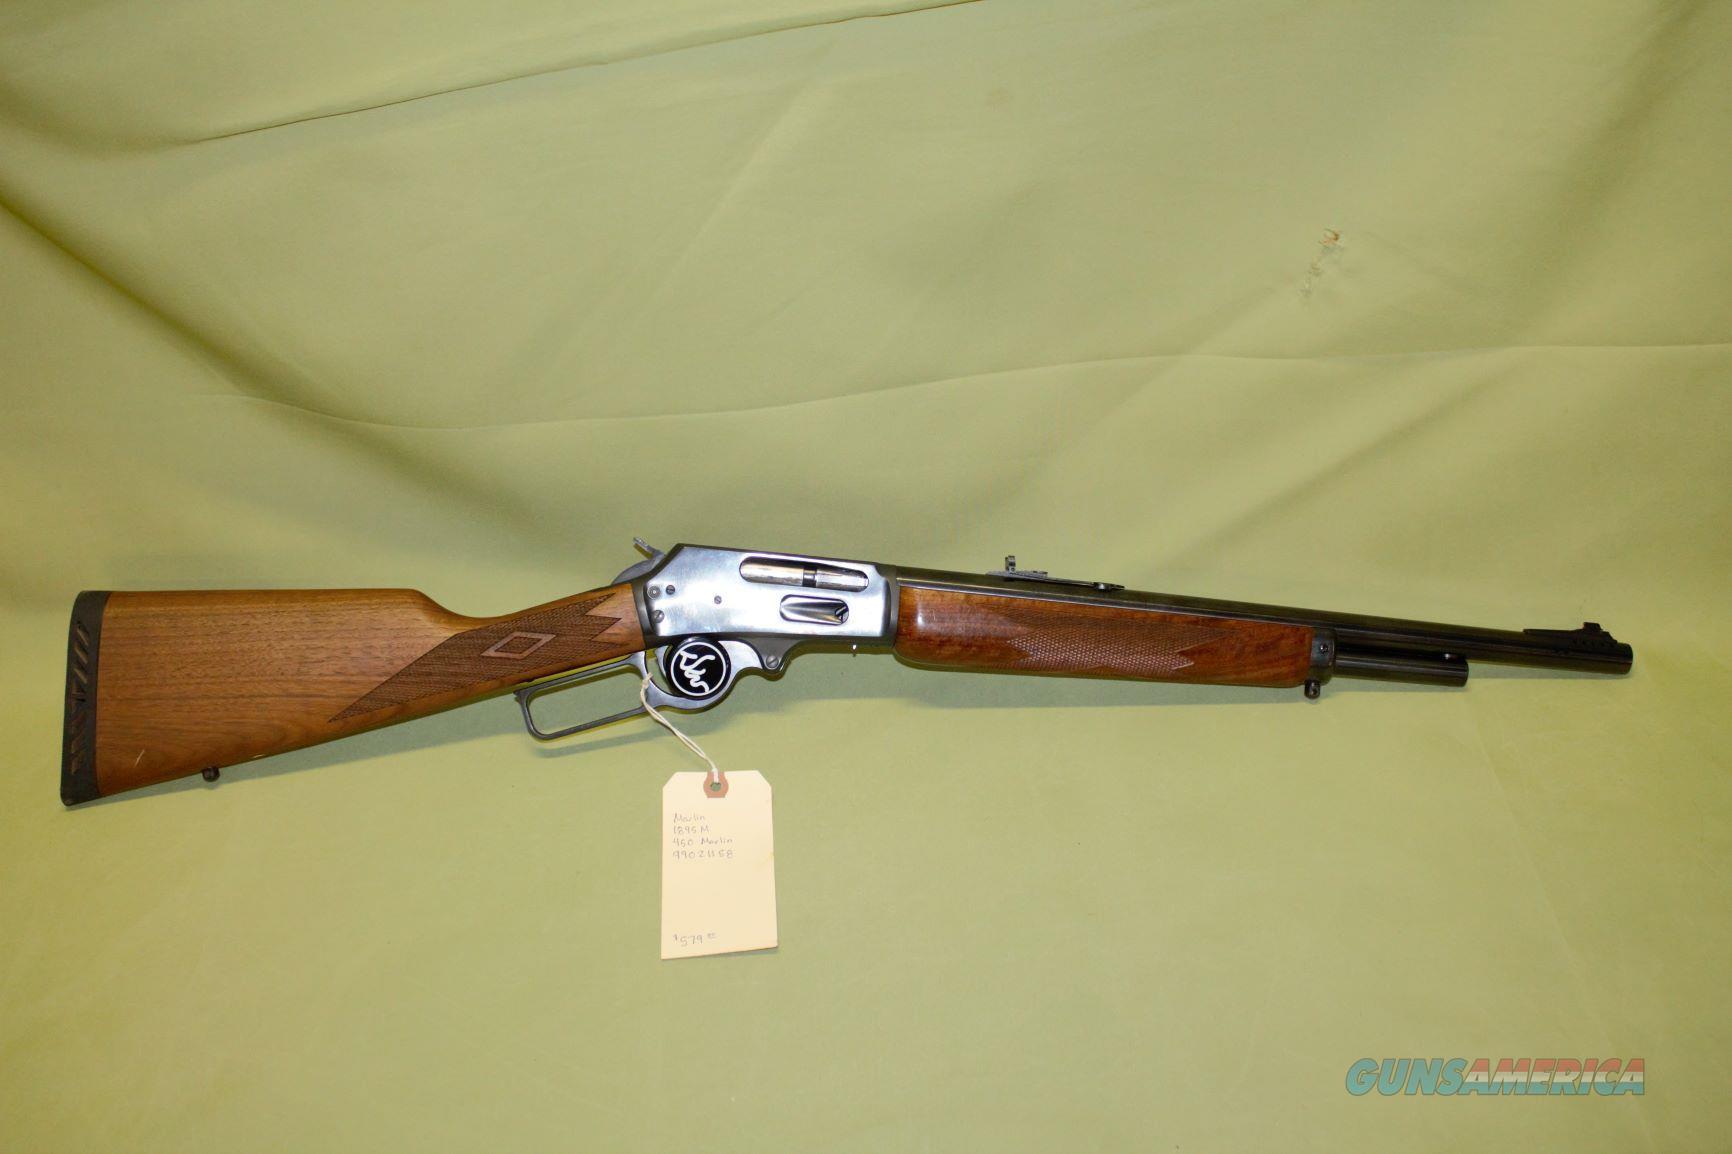 Marlin 1895M 450 Marlin  Guns > Rifles > Marlin Rifles > Modern > Lever Action